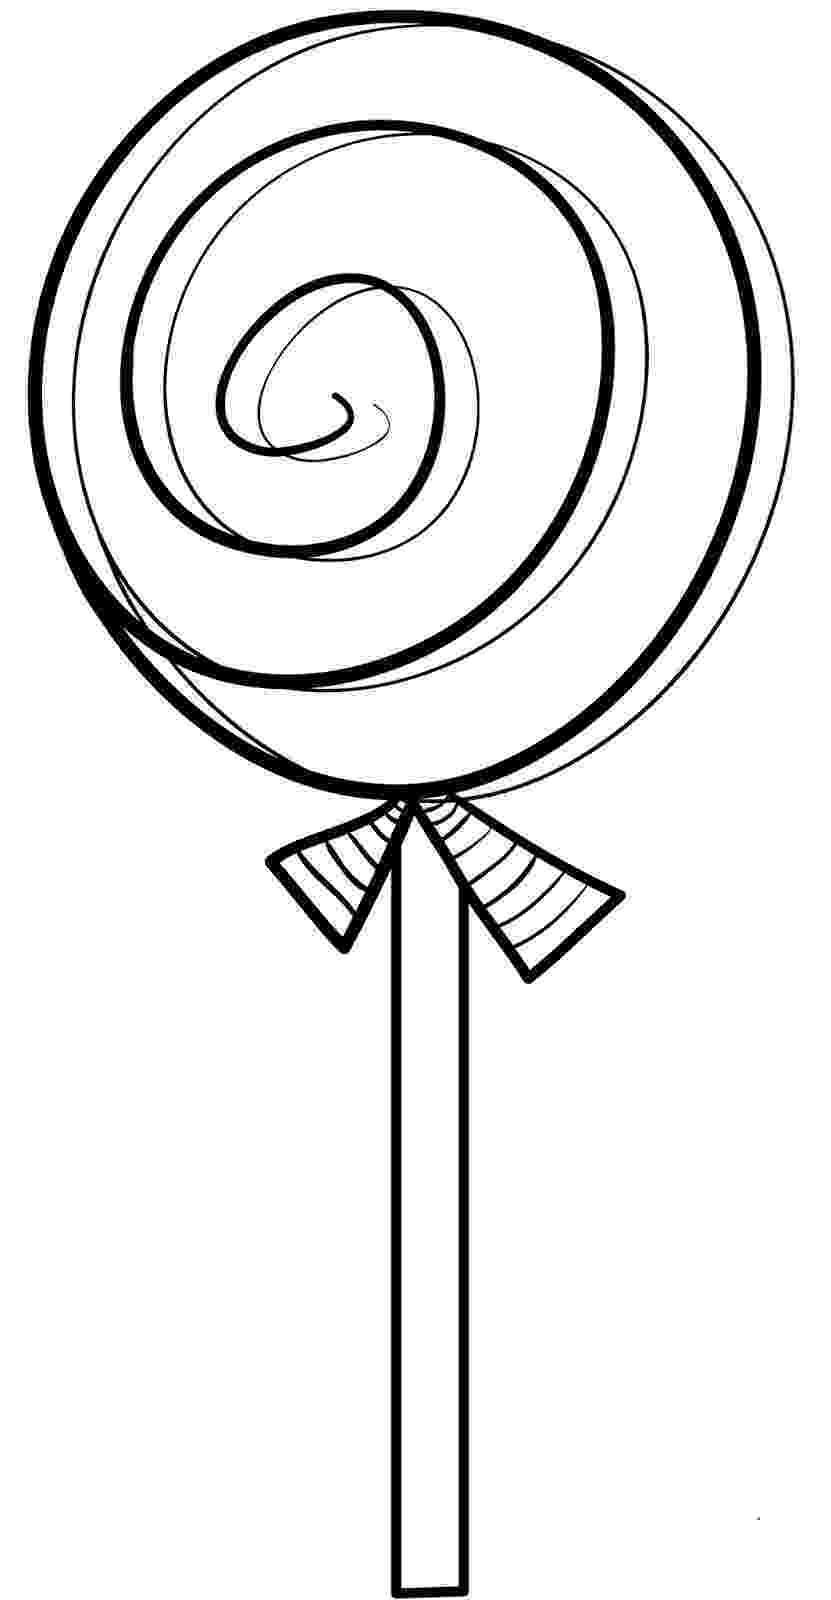 lollipop coloring pages lost in paper scraps free files friday lollipop coloring pages